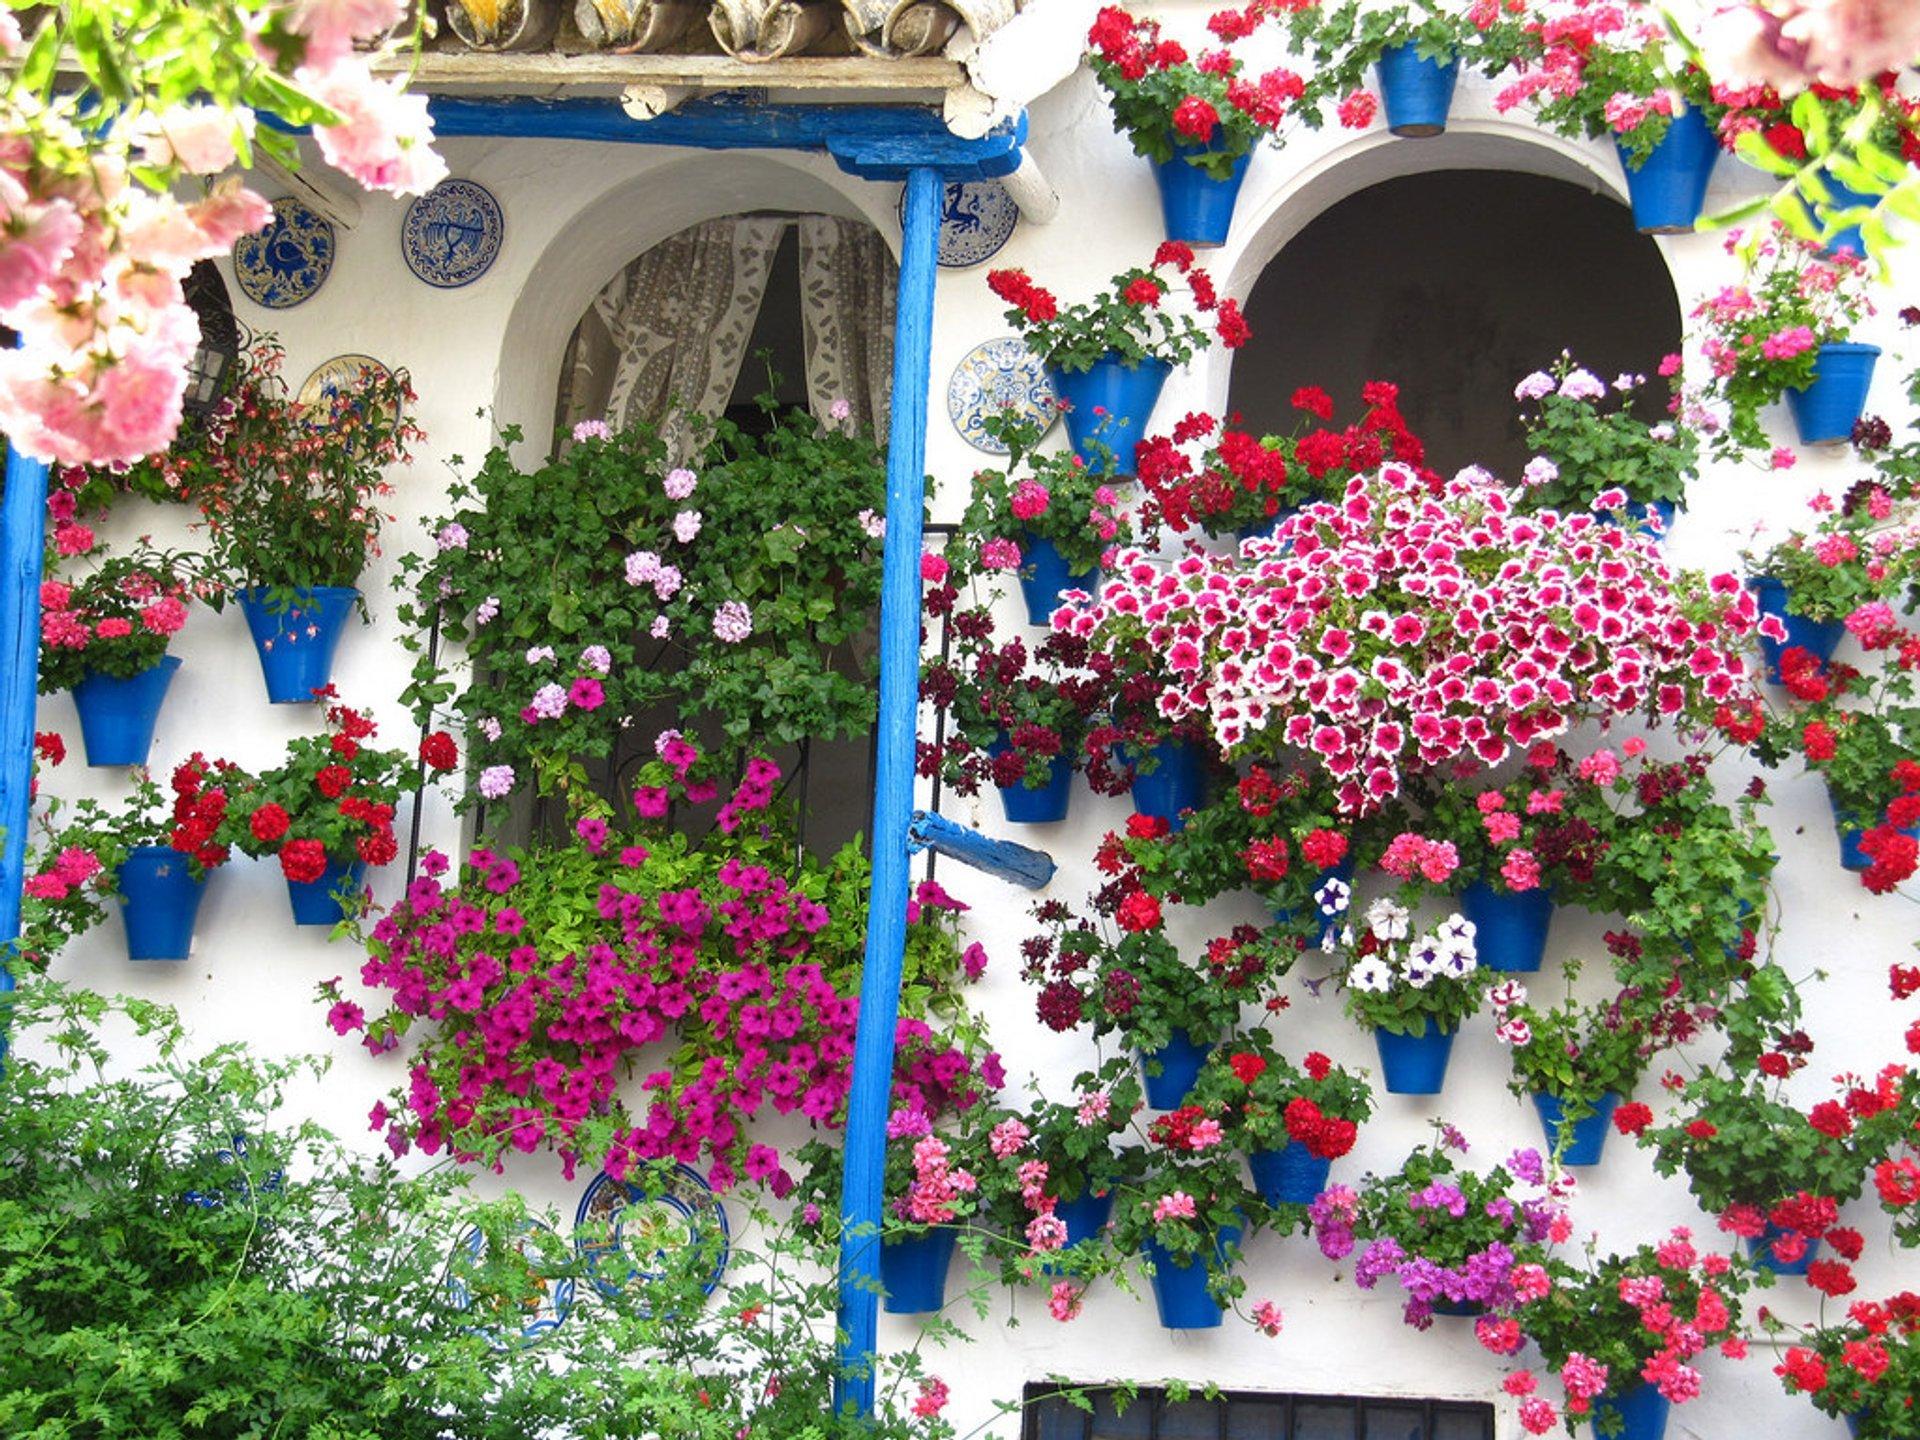 Córdoba Patios Festival in Spain - Best Time